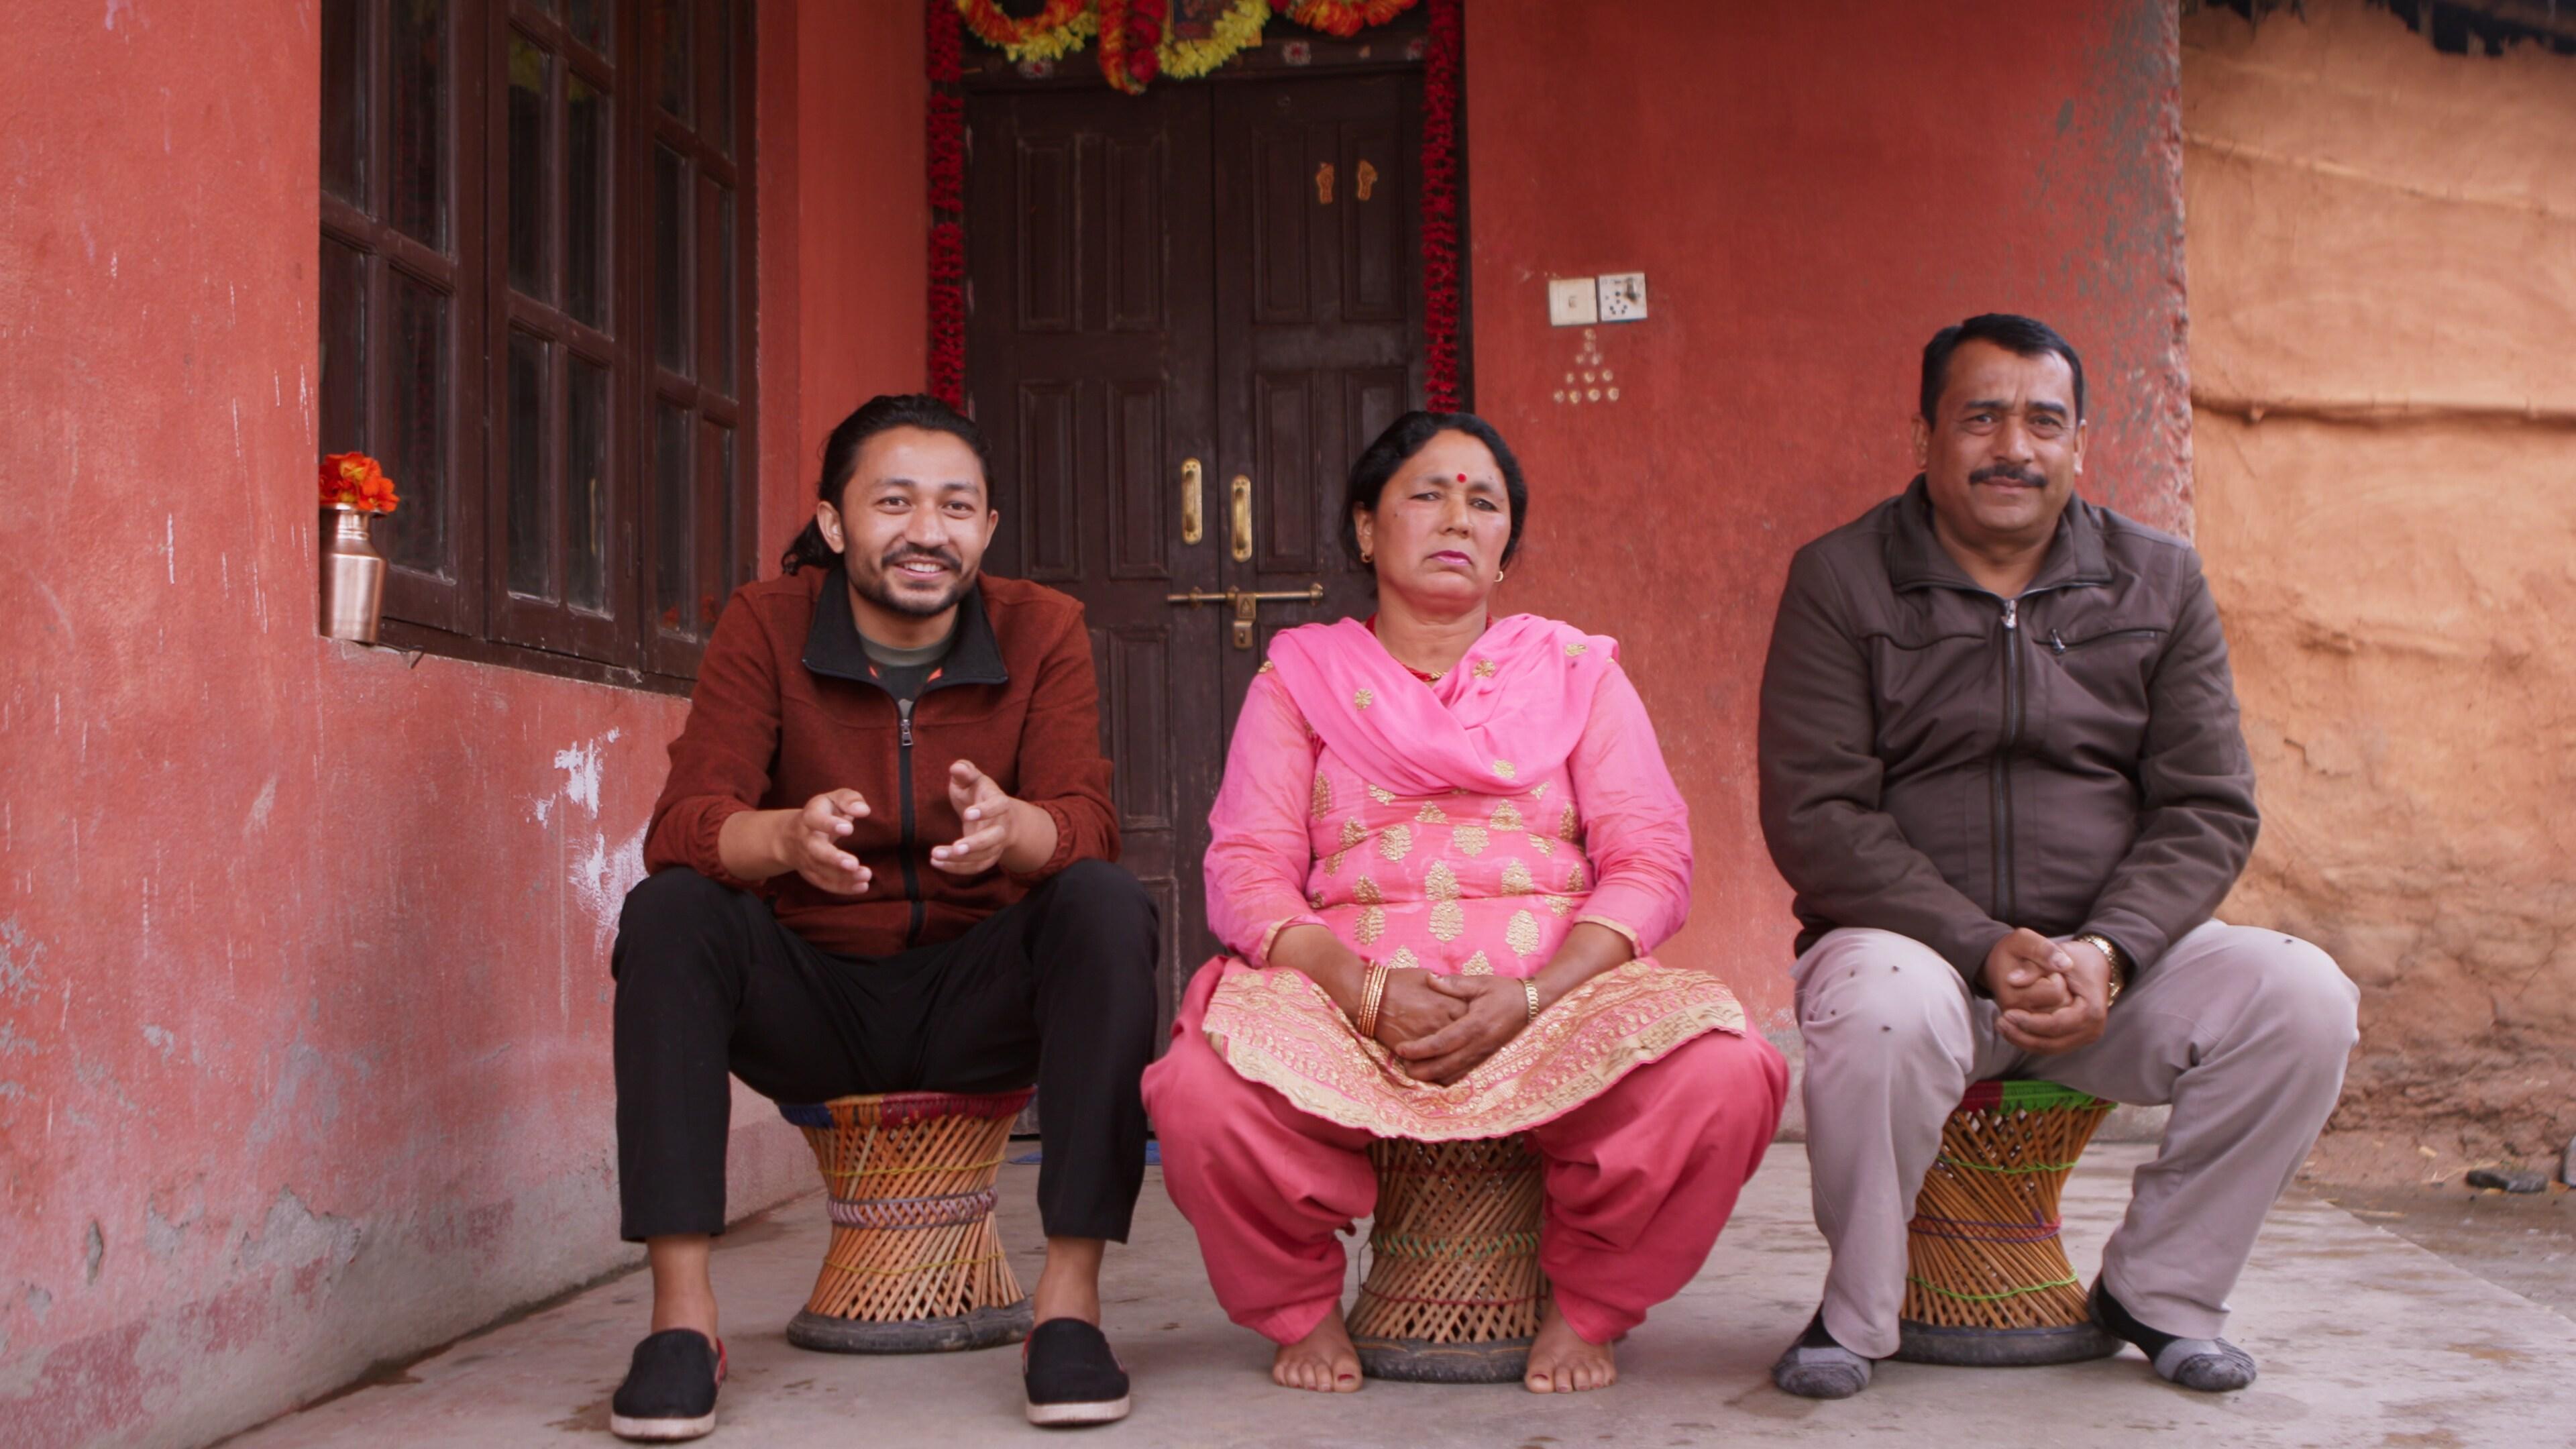 Bhaktapur, Nepal - Santosh Pandey (L) with his parents Chandra Pandey and Gauri Pandey. (Credit: Future of Work Film Inc)